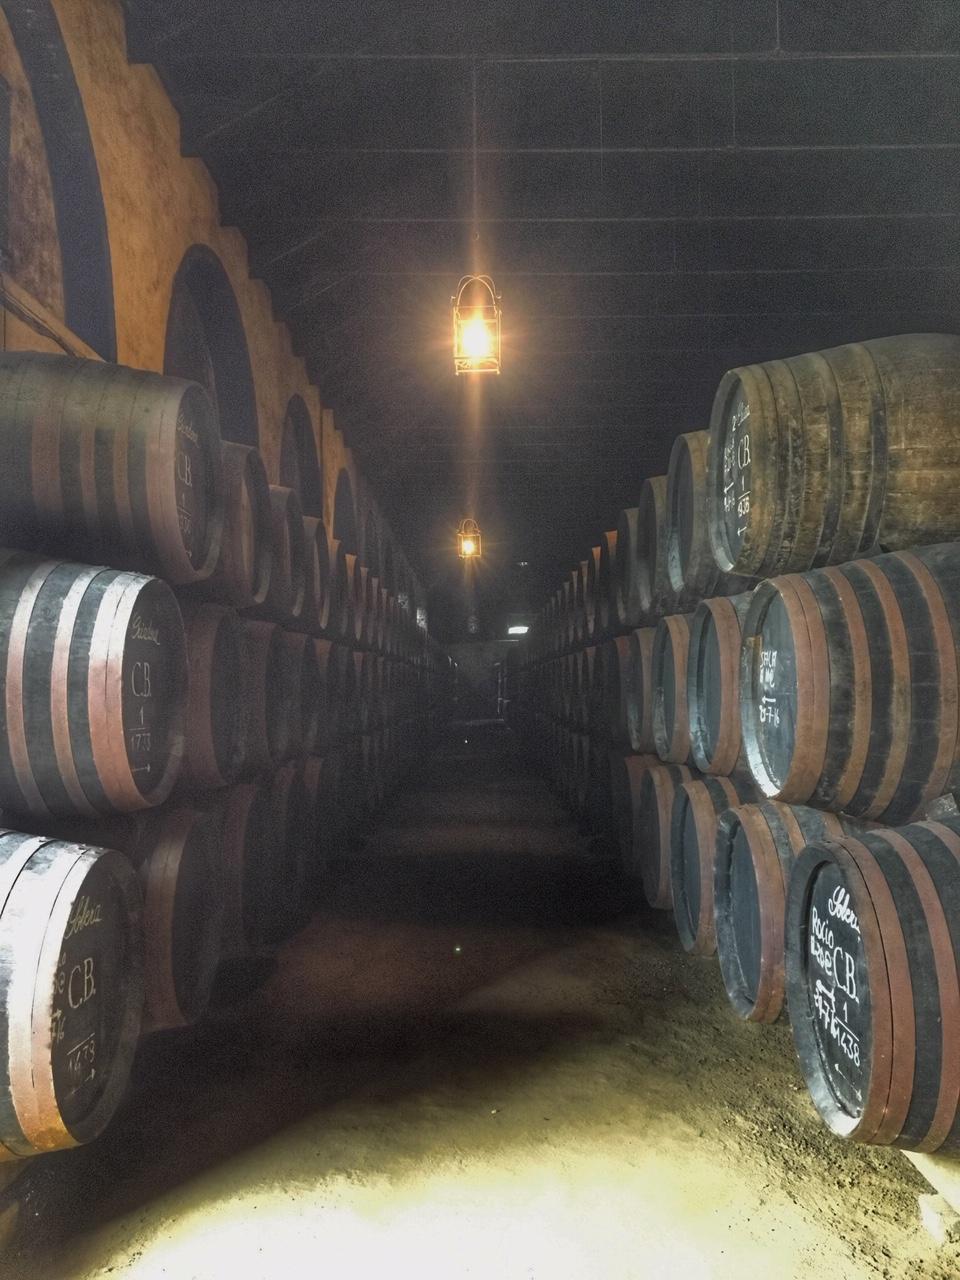 Sherry Cask Cellar